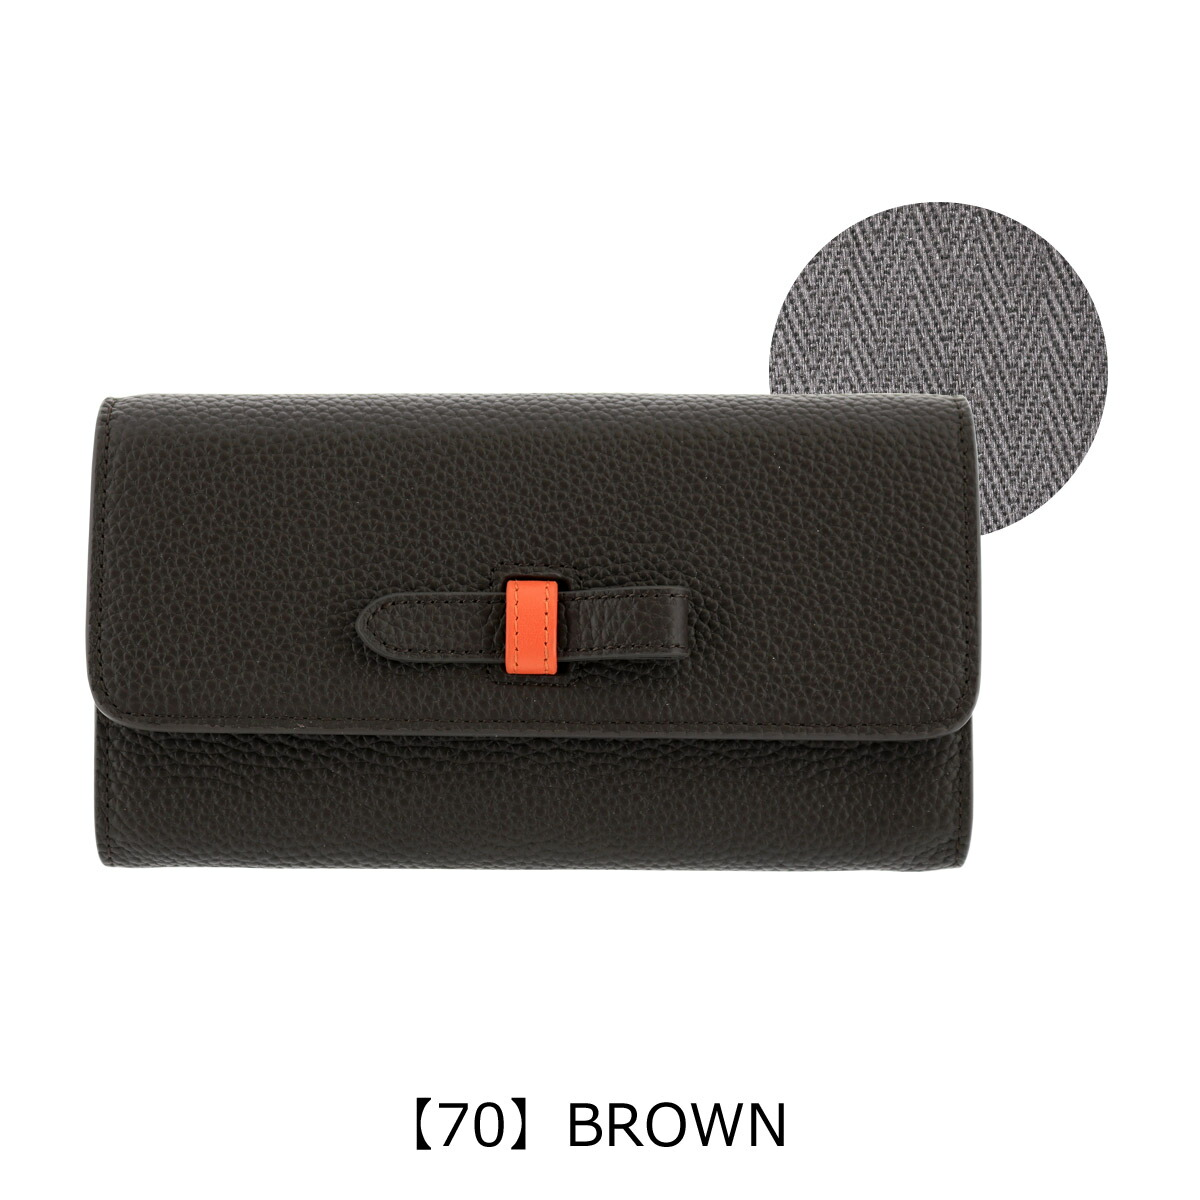 【70】BROWN